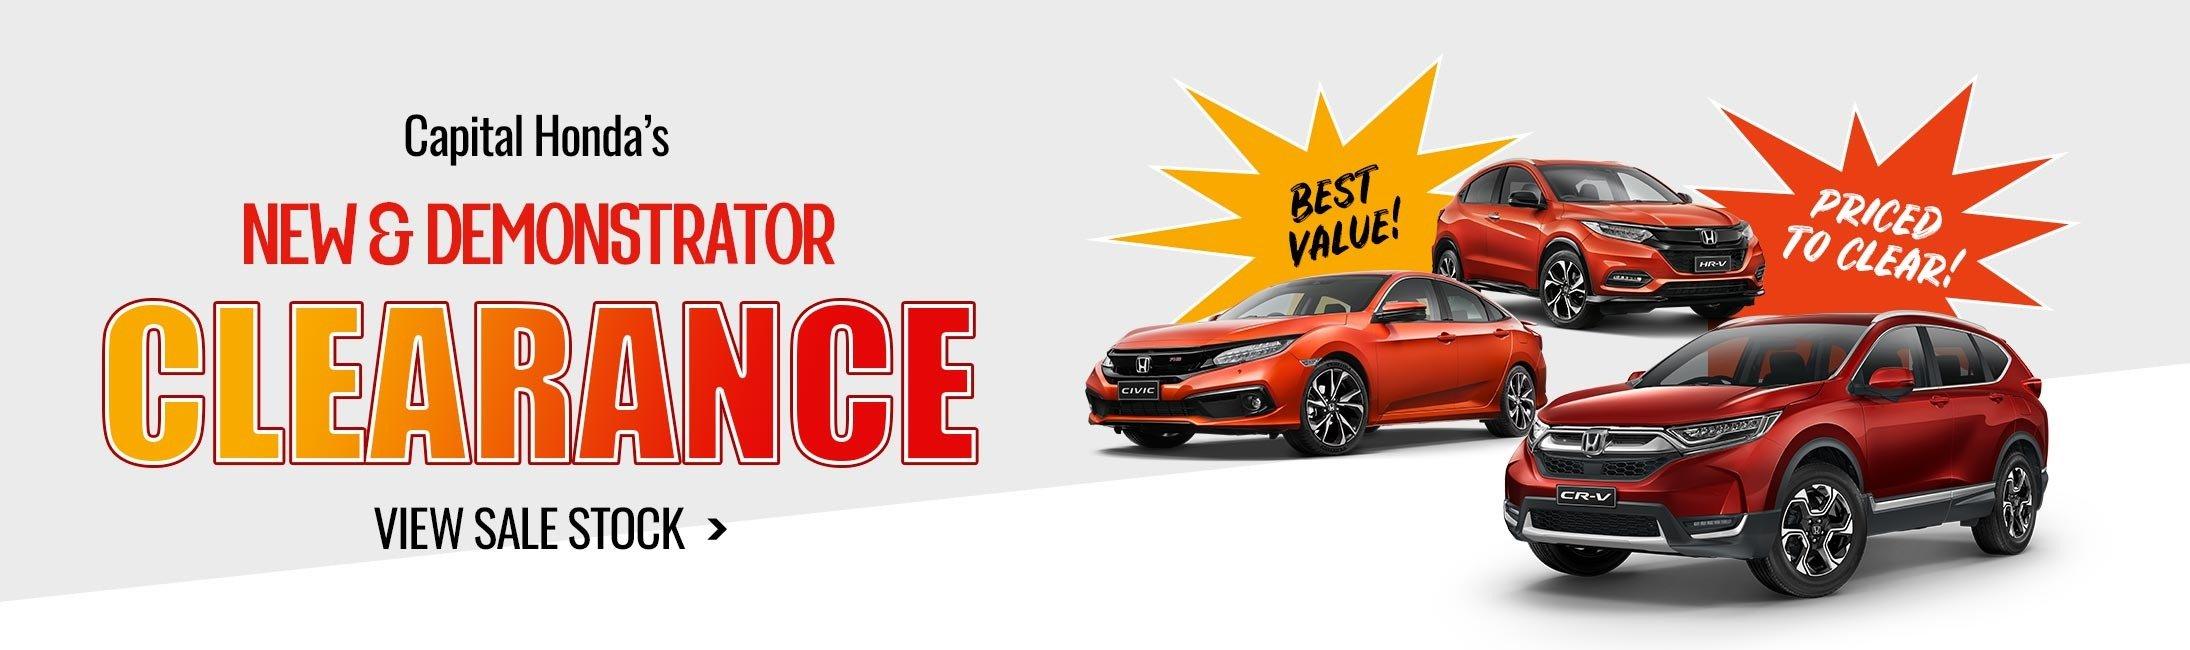 Capital Honda Clearance Sale